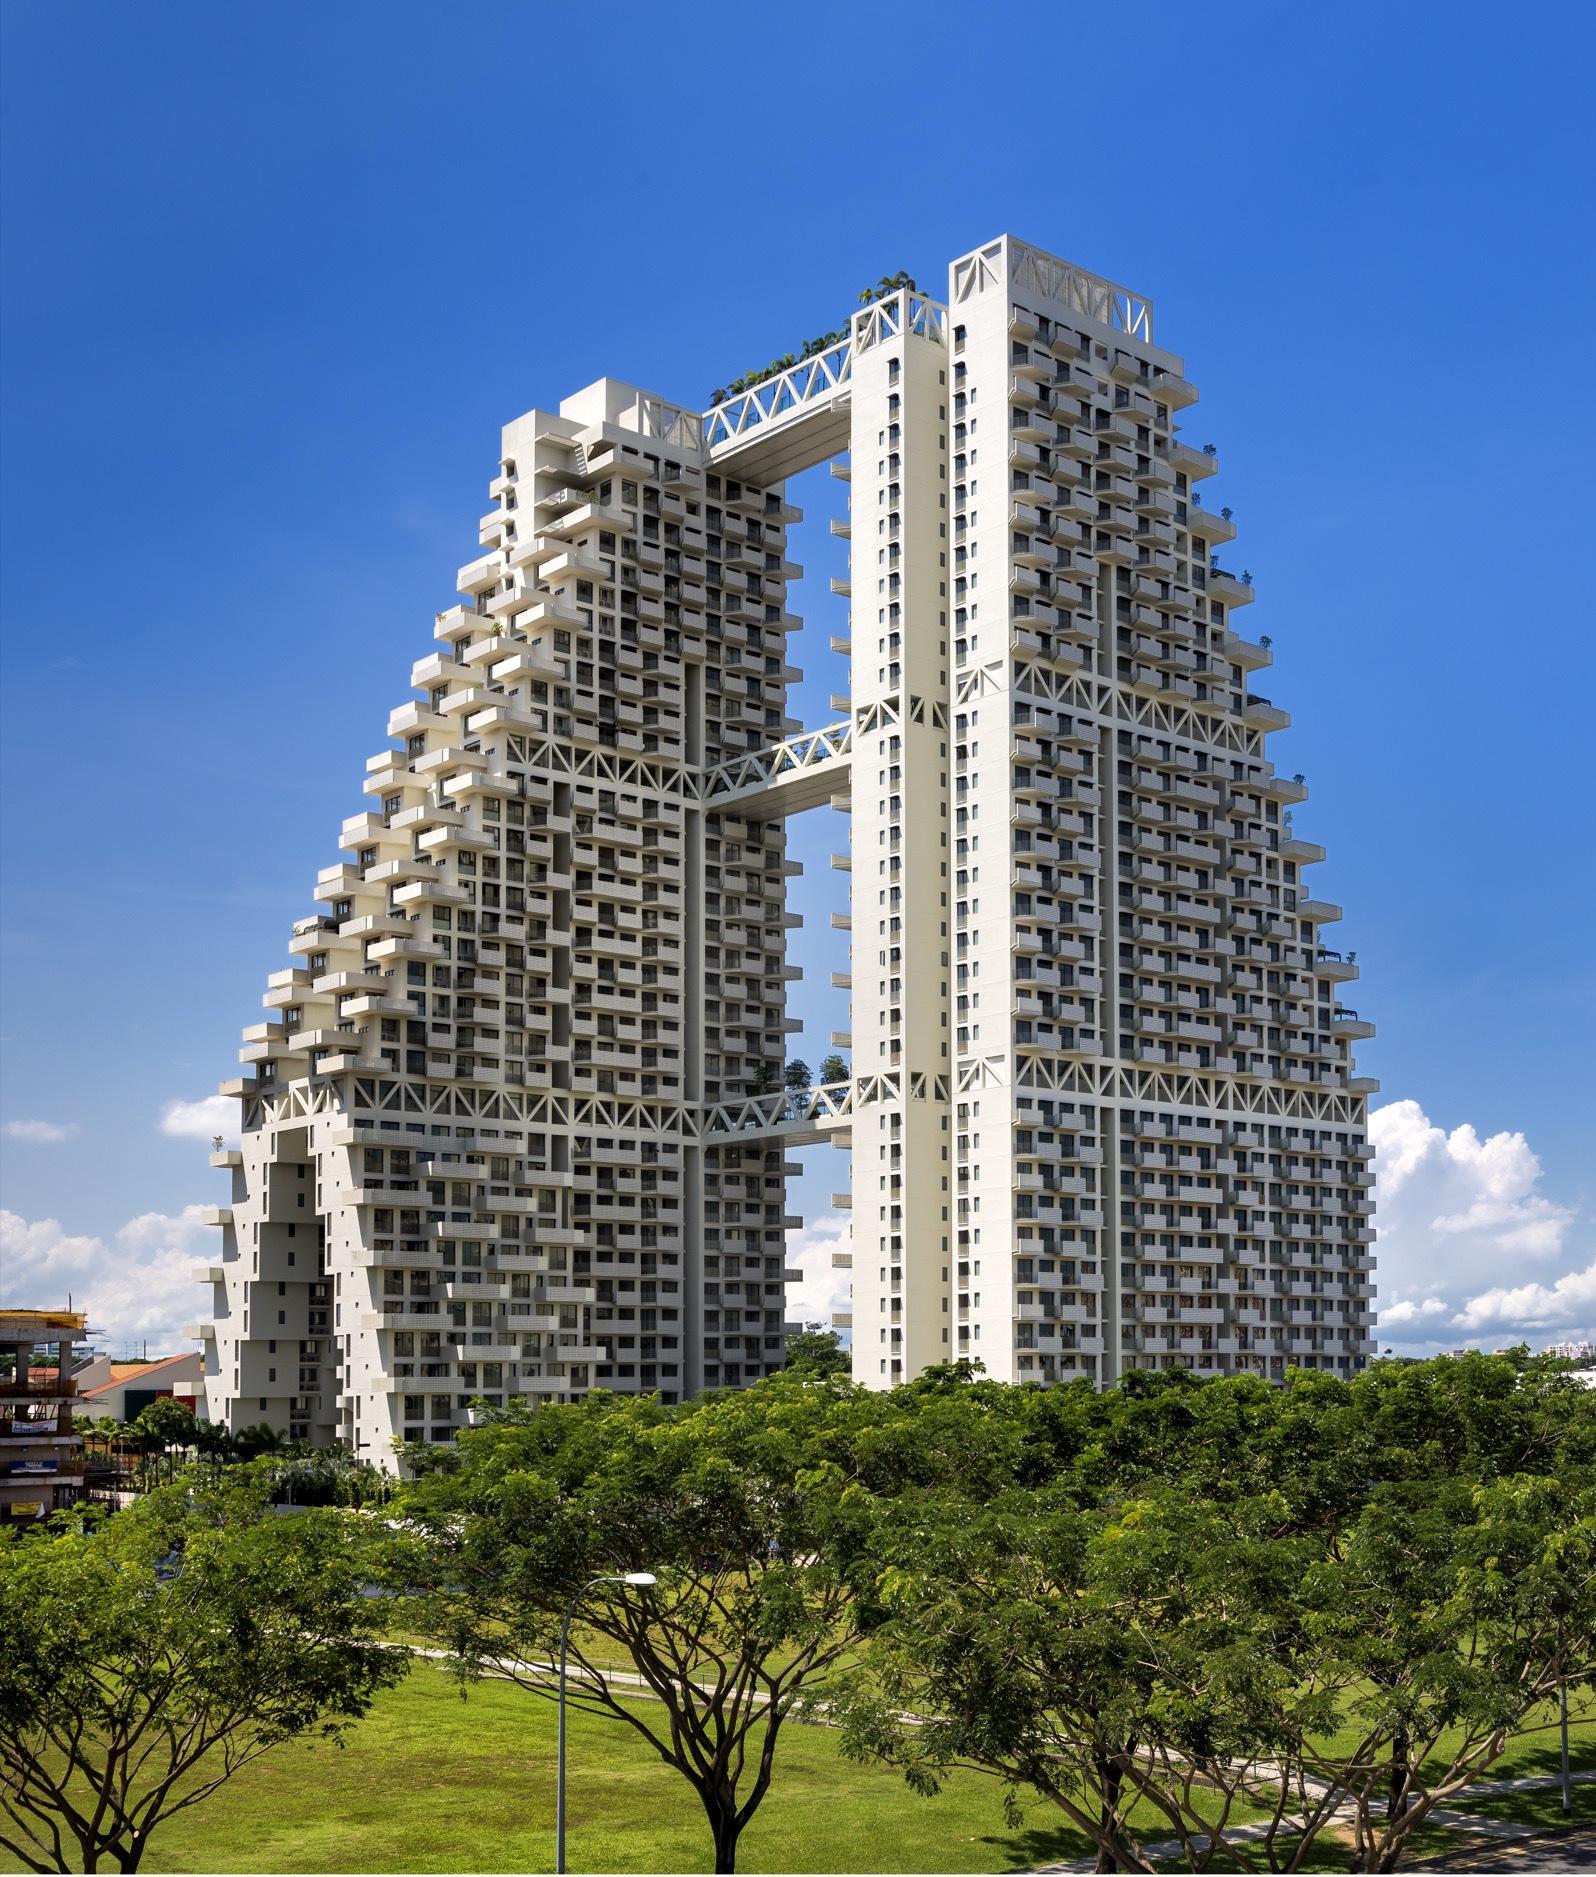 Apartments In Singapore: Sky Habitat Singapore / Safdie Architects